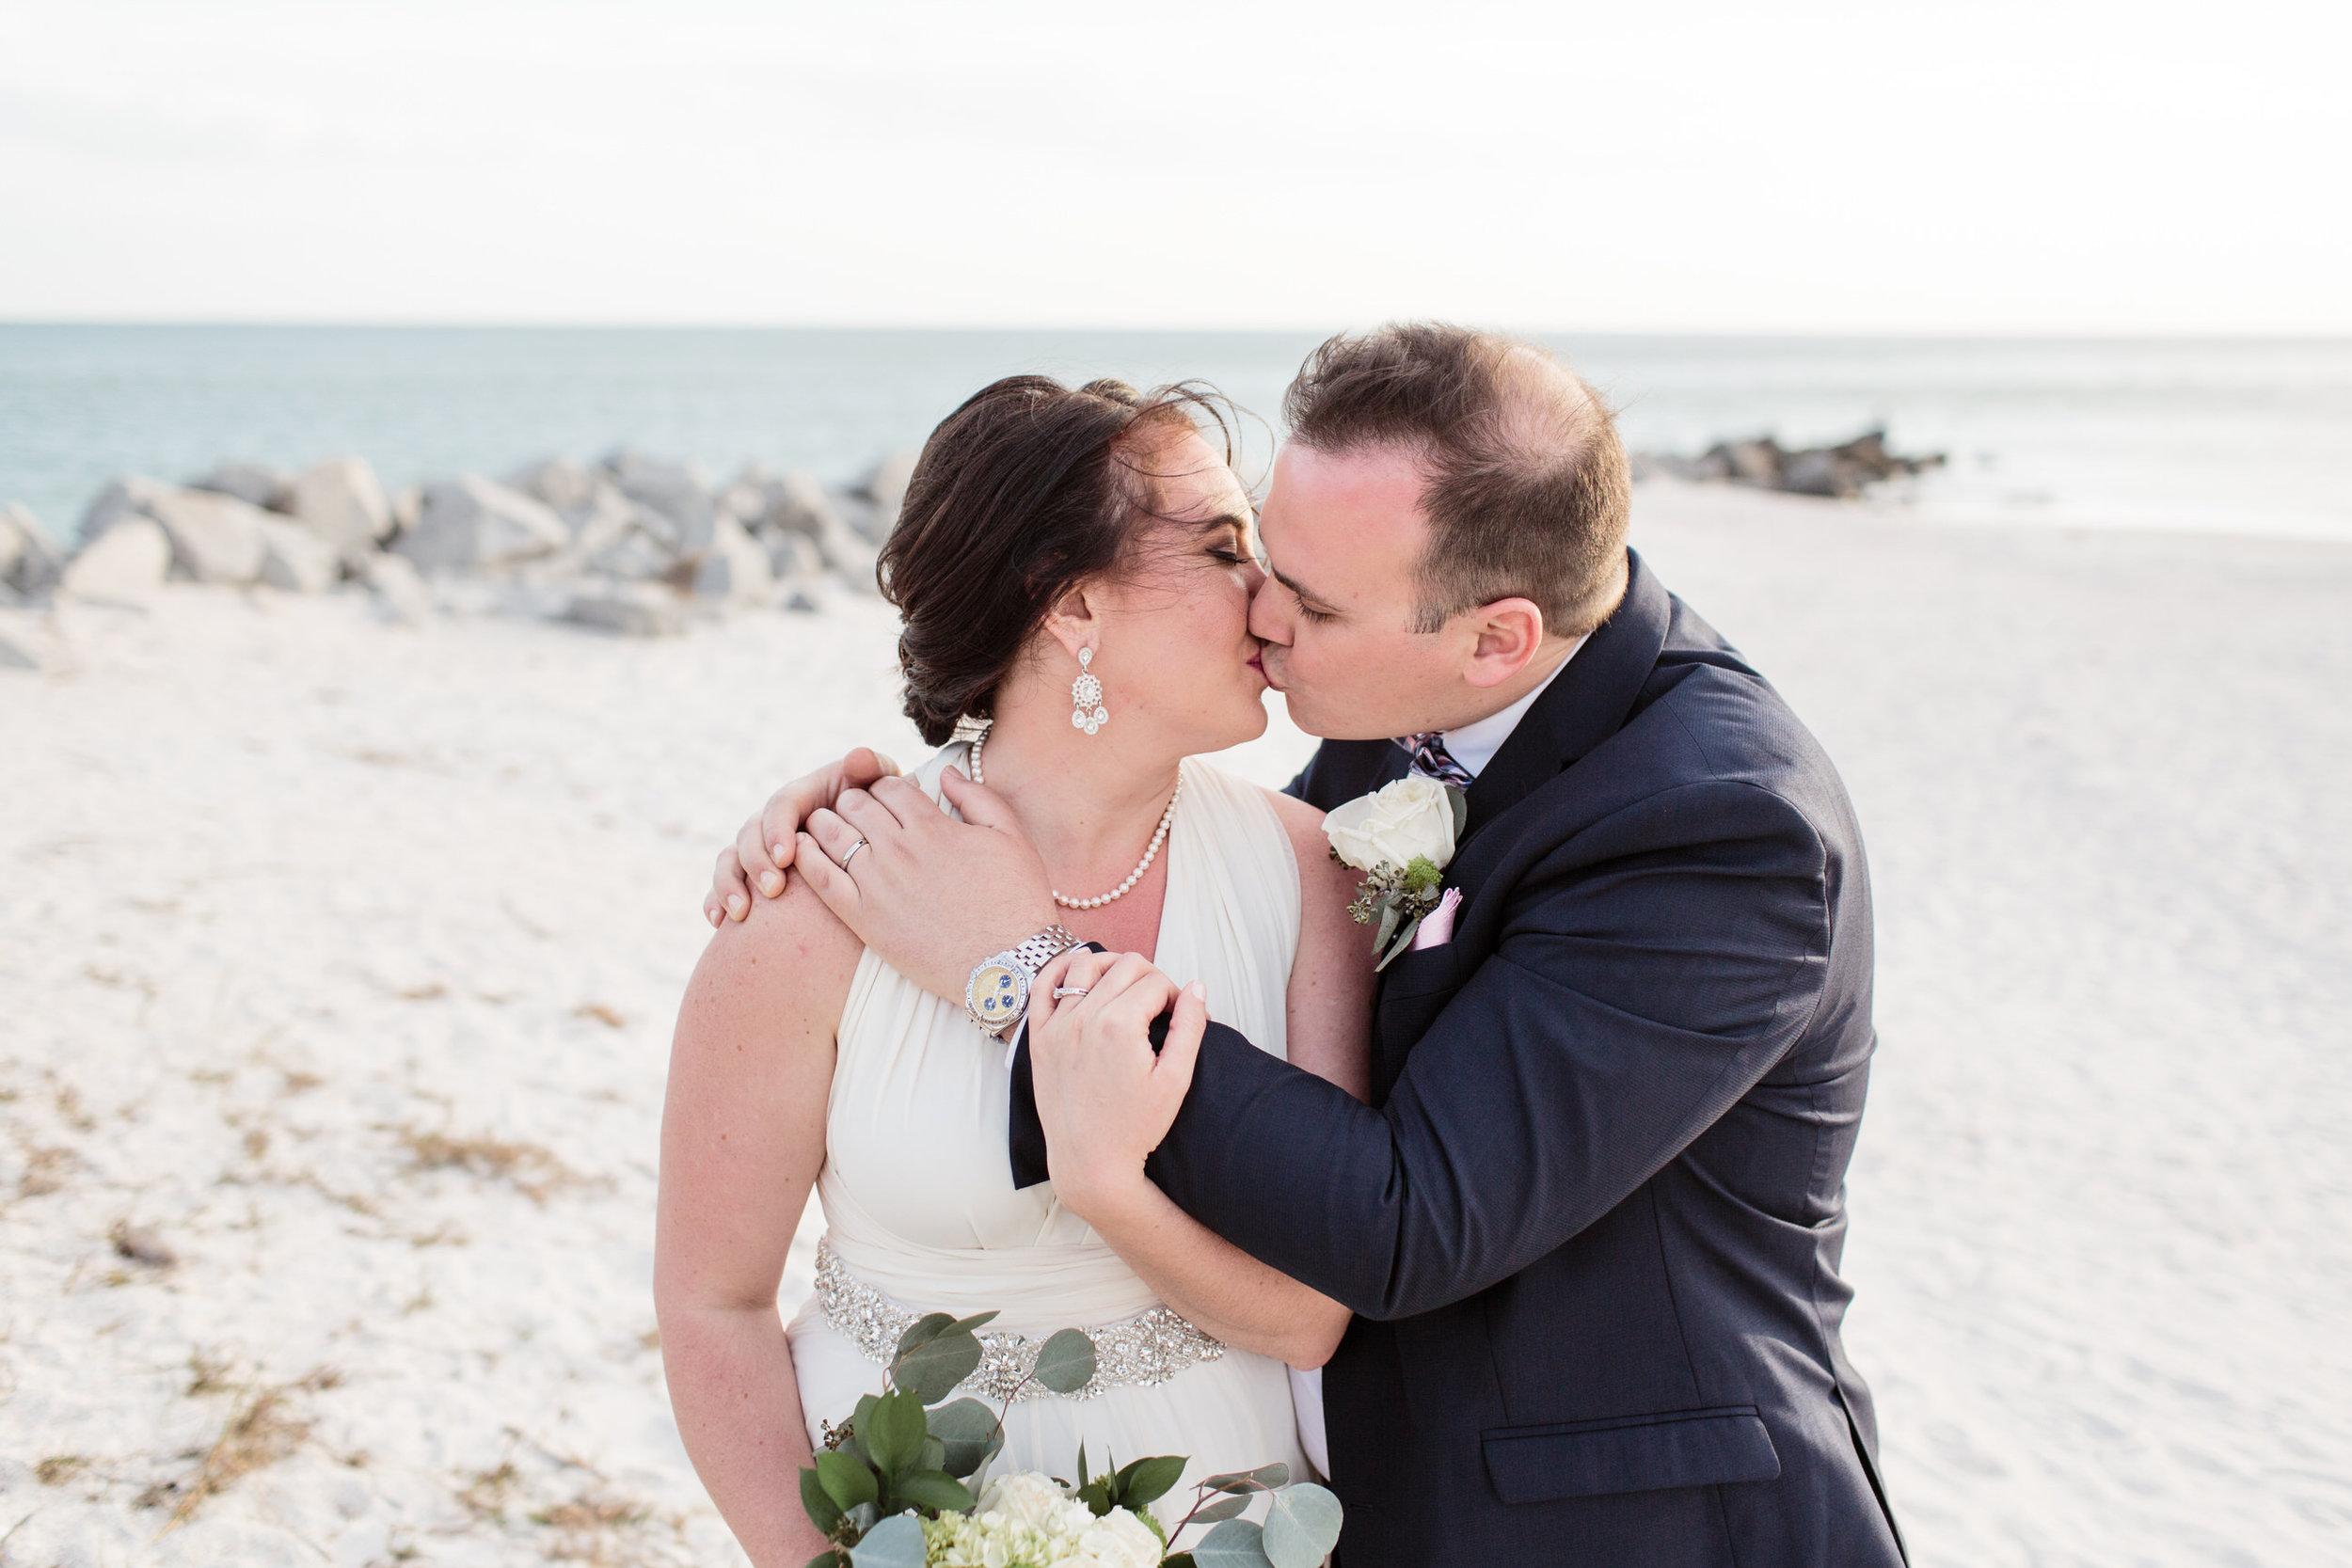 Beltran_Treasure_Island_Elopement_Tampa_Wedding_107-1.jpg